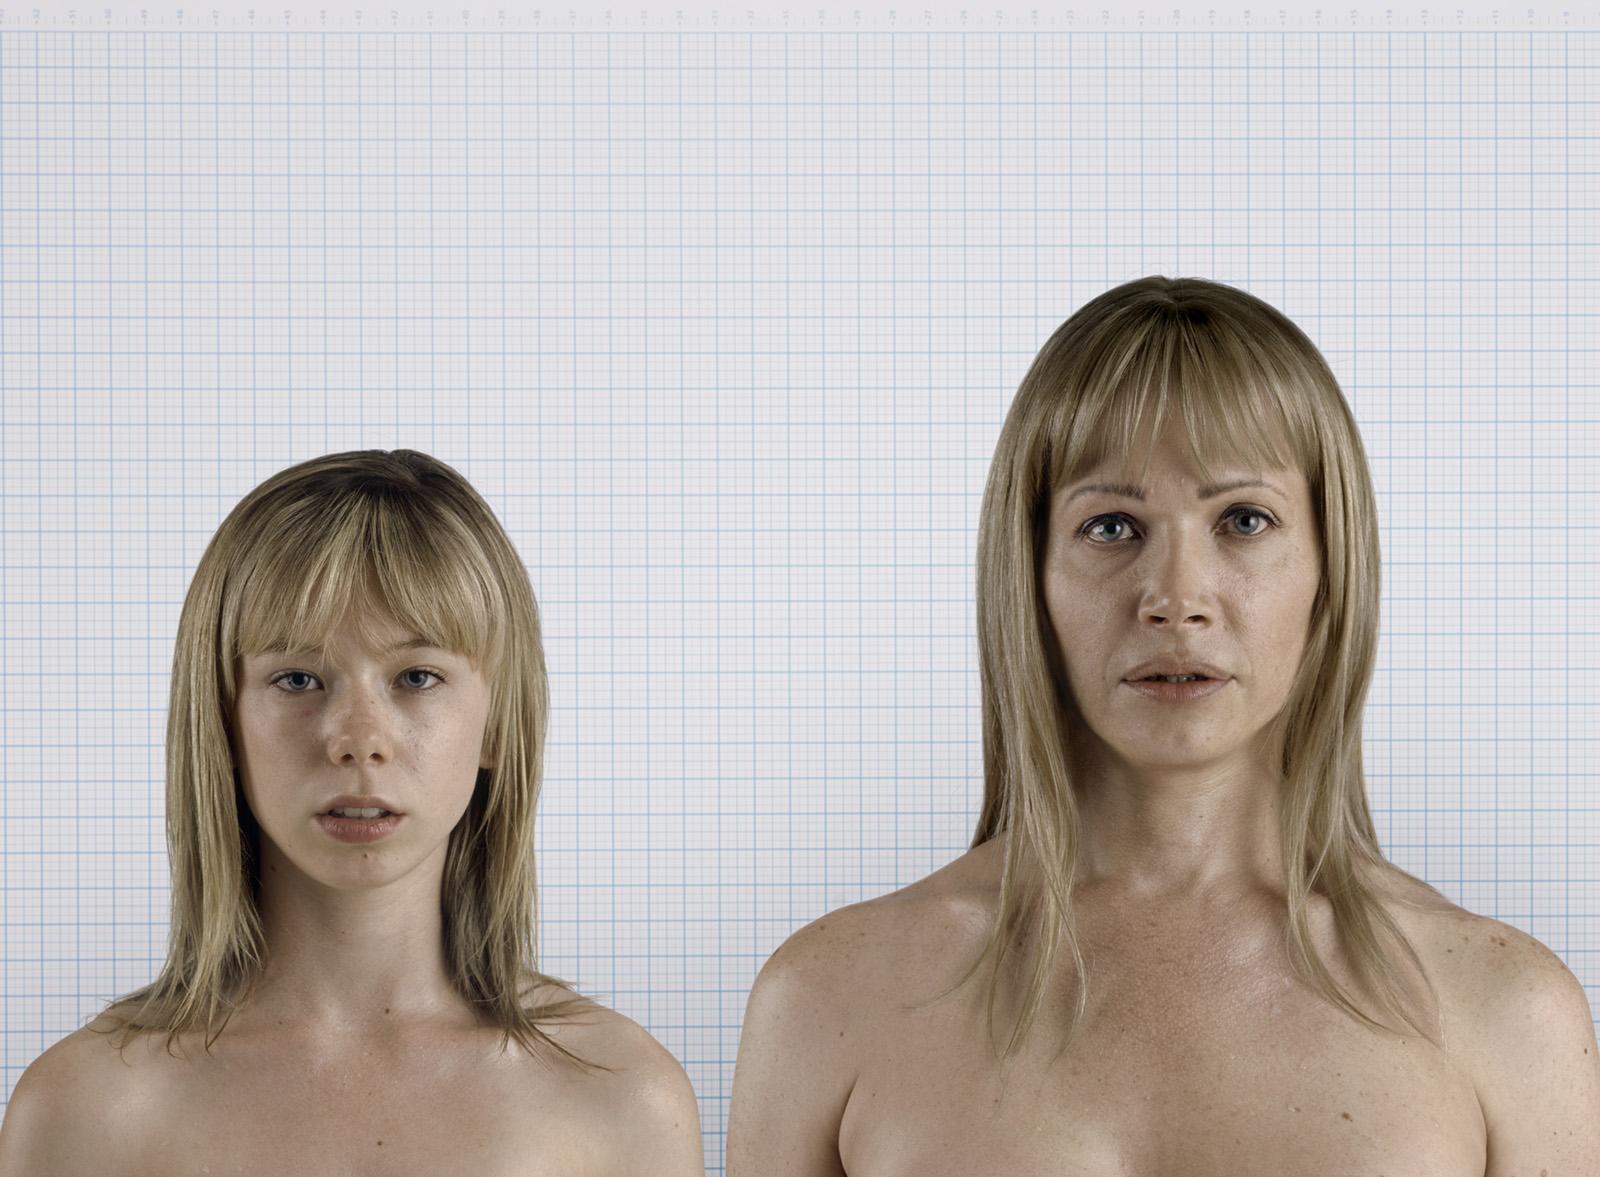 breast budding female puberty